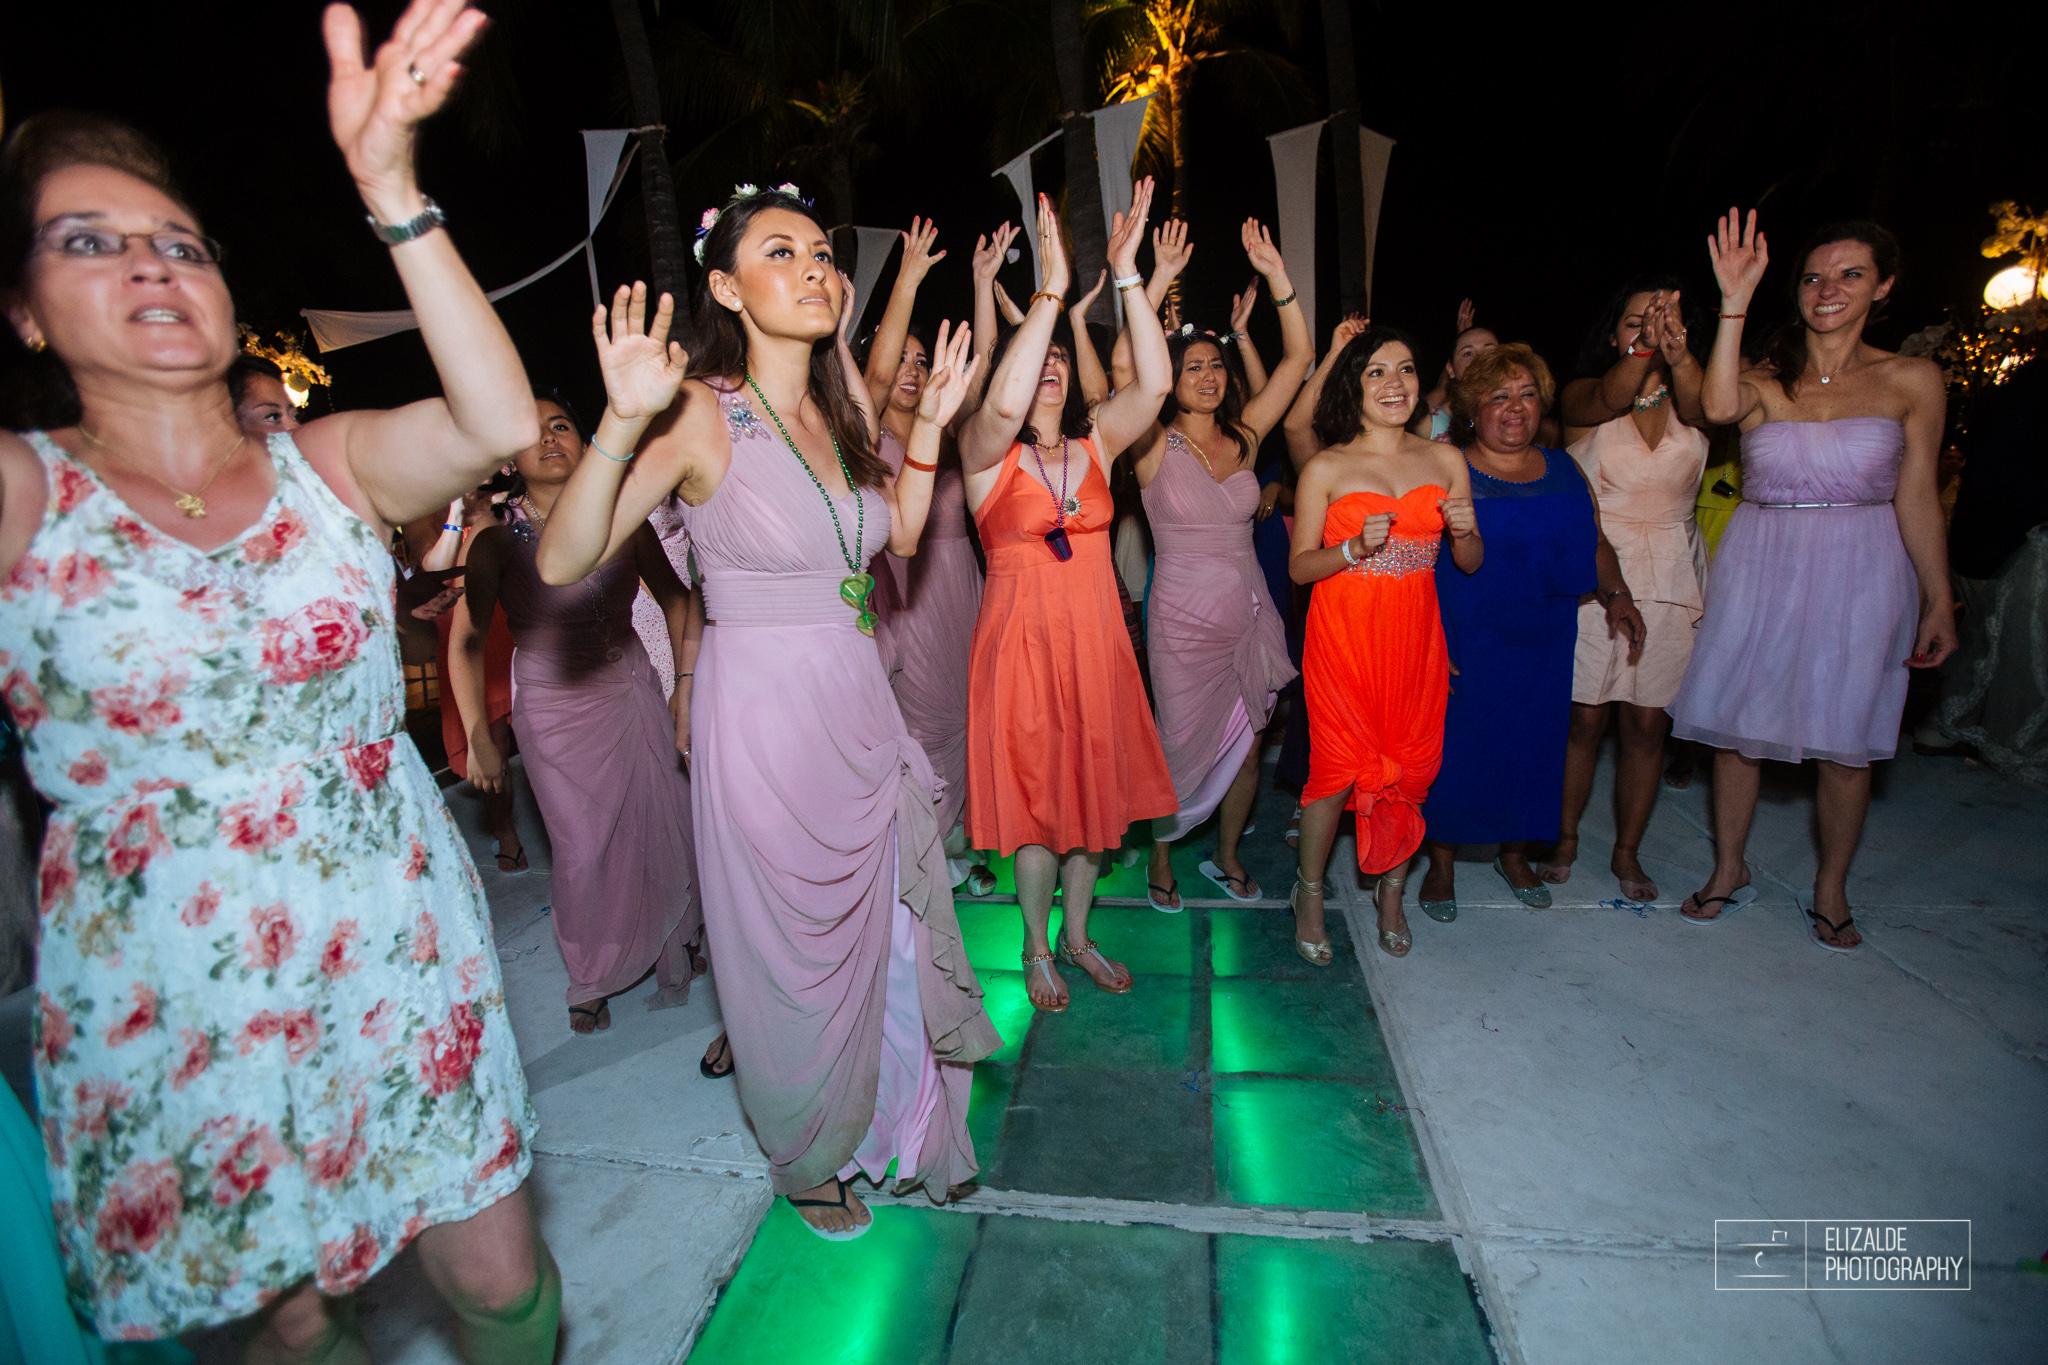 Pay and Ferran_Acapulco_Destination Wedding_Elizalde Photography-175.jpg